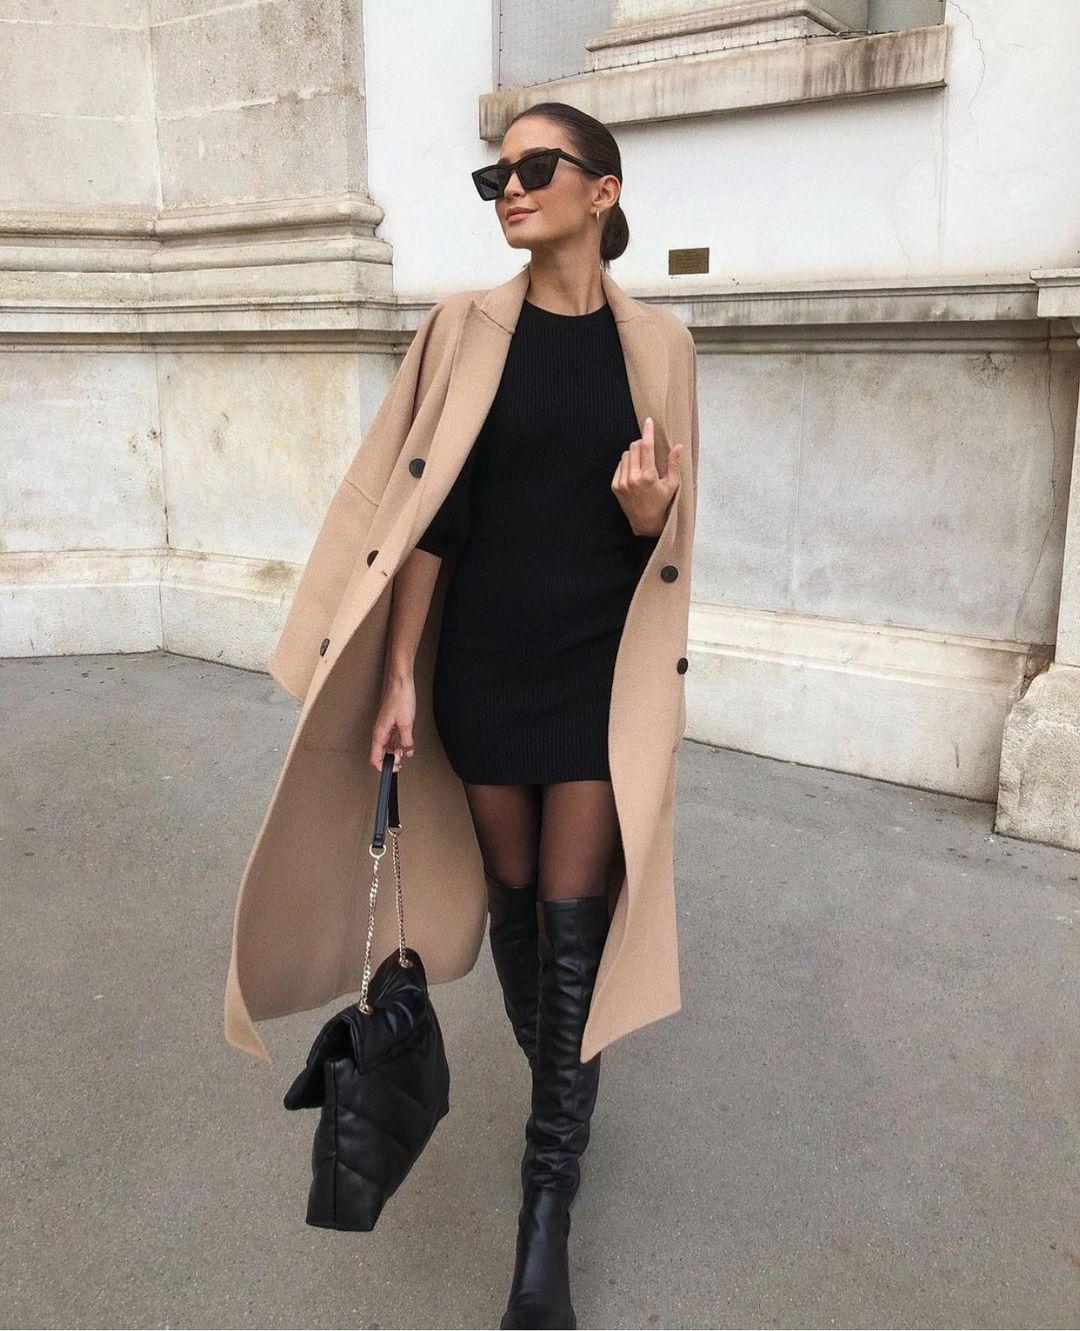 manteau oversize de Zara sur zara.outfits